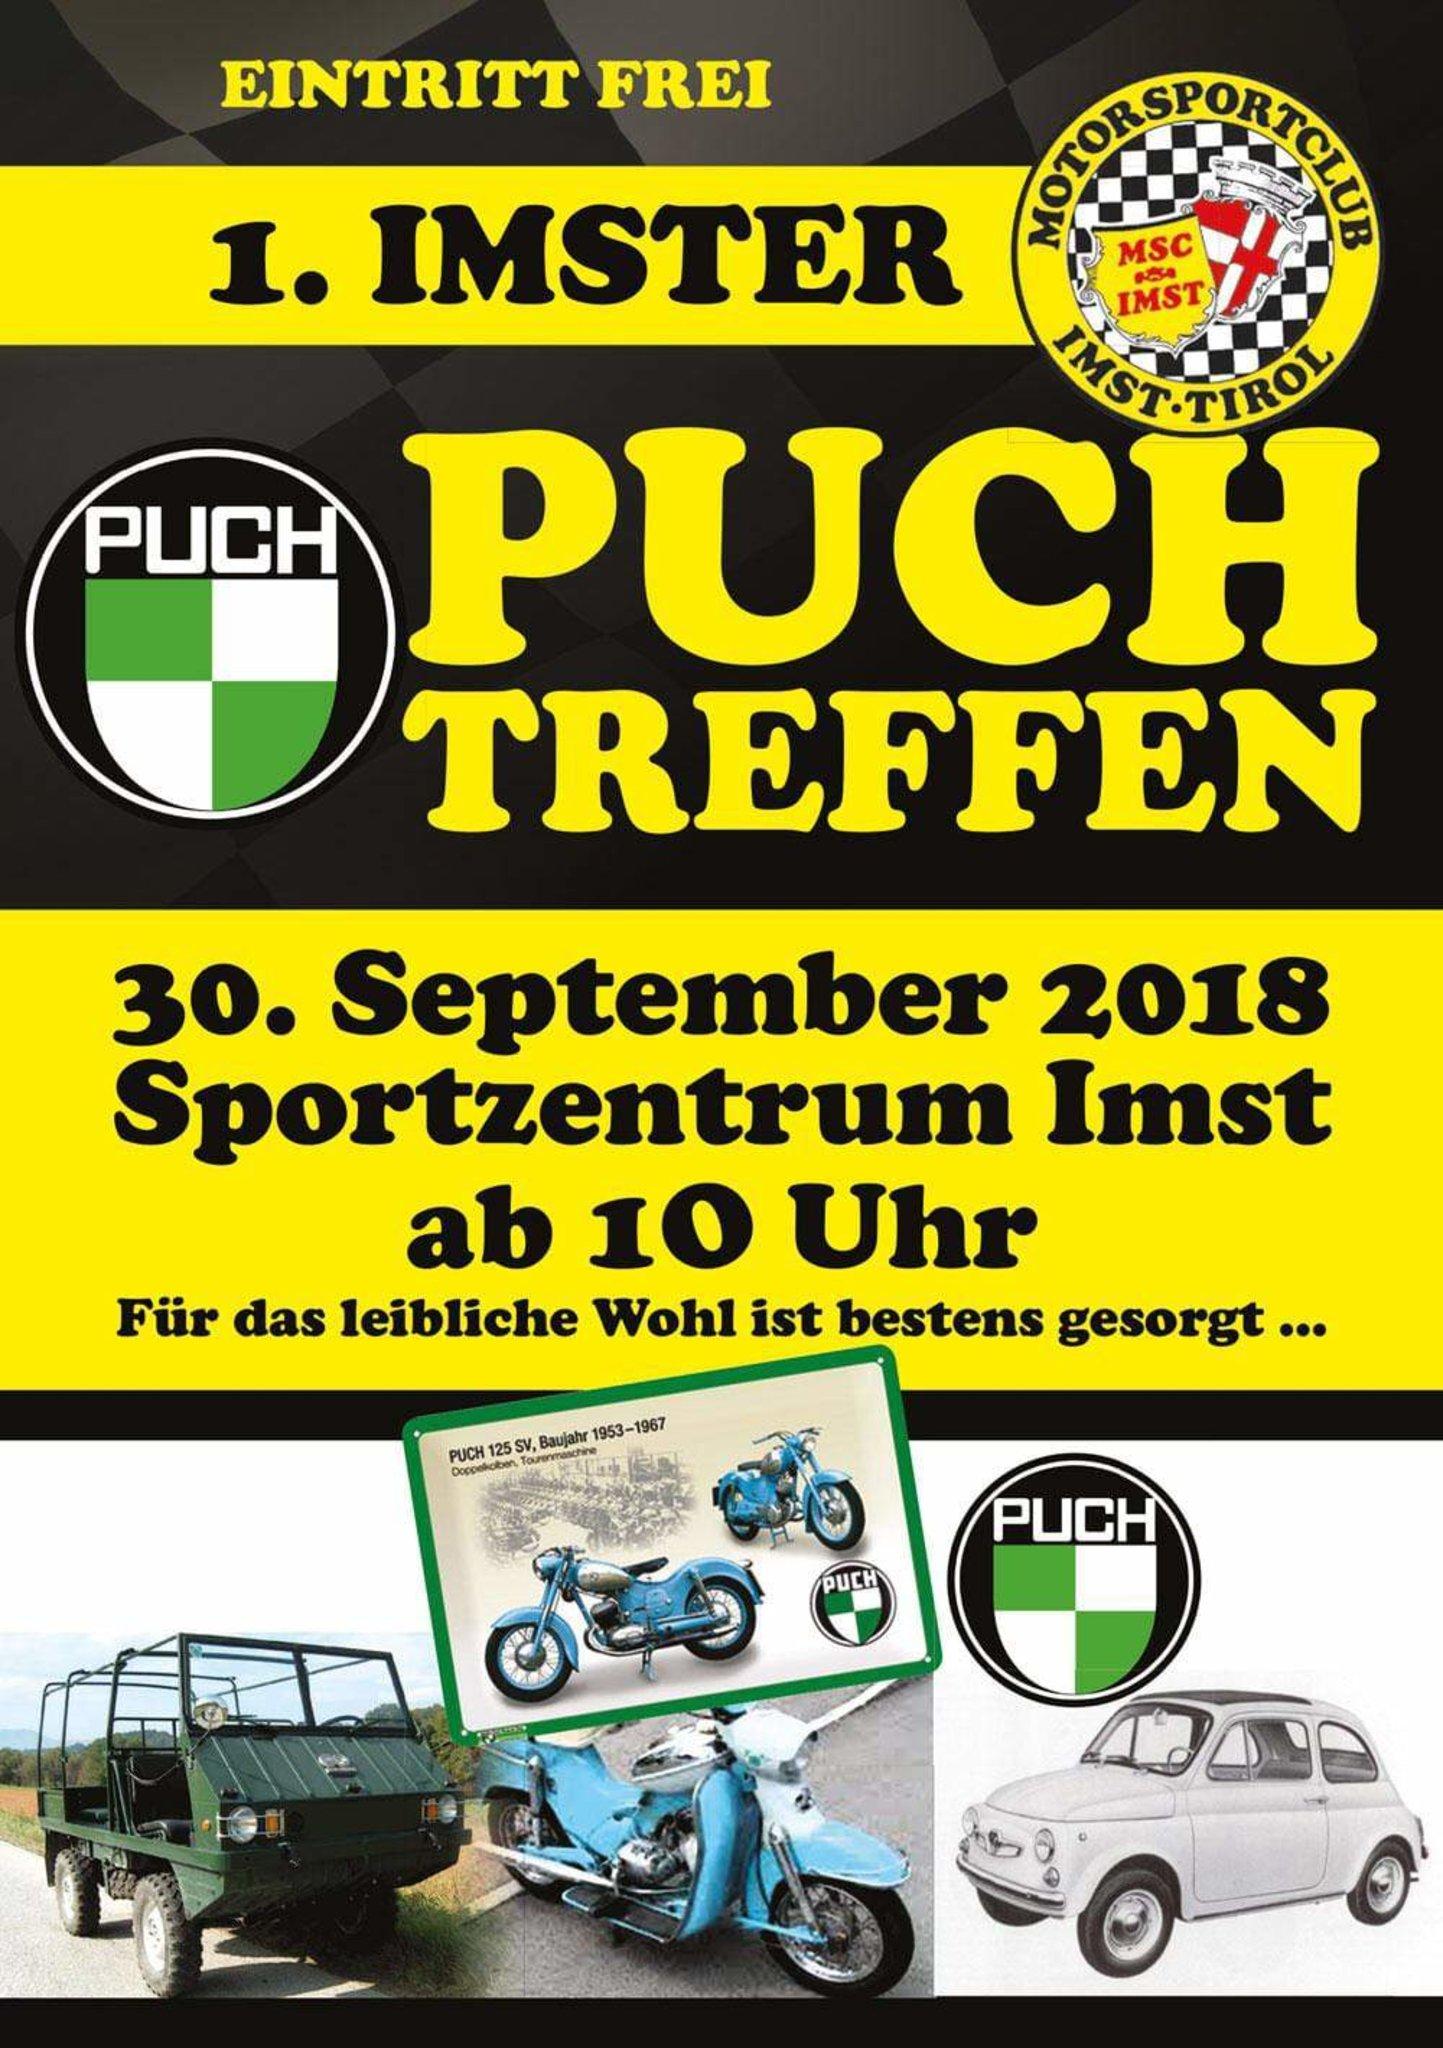 Kfer-Oldtimertreffen-Tirol - Posts | Facebook